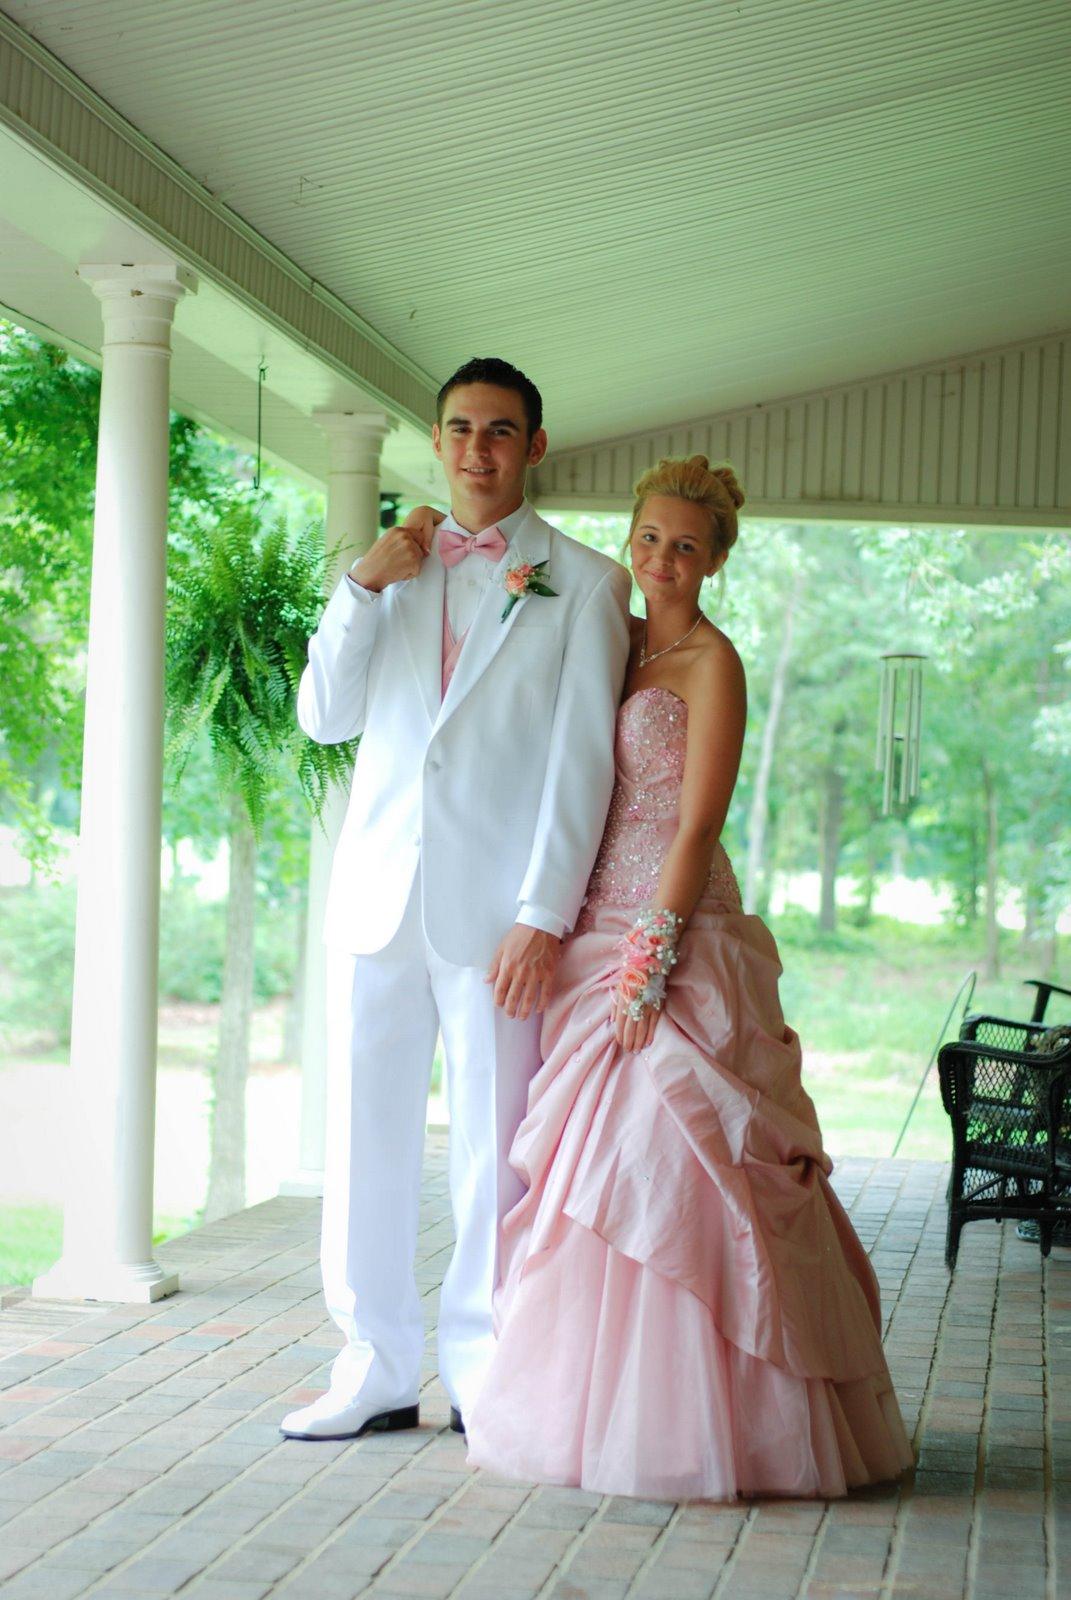 Prom couple dress up